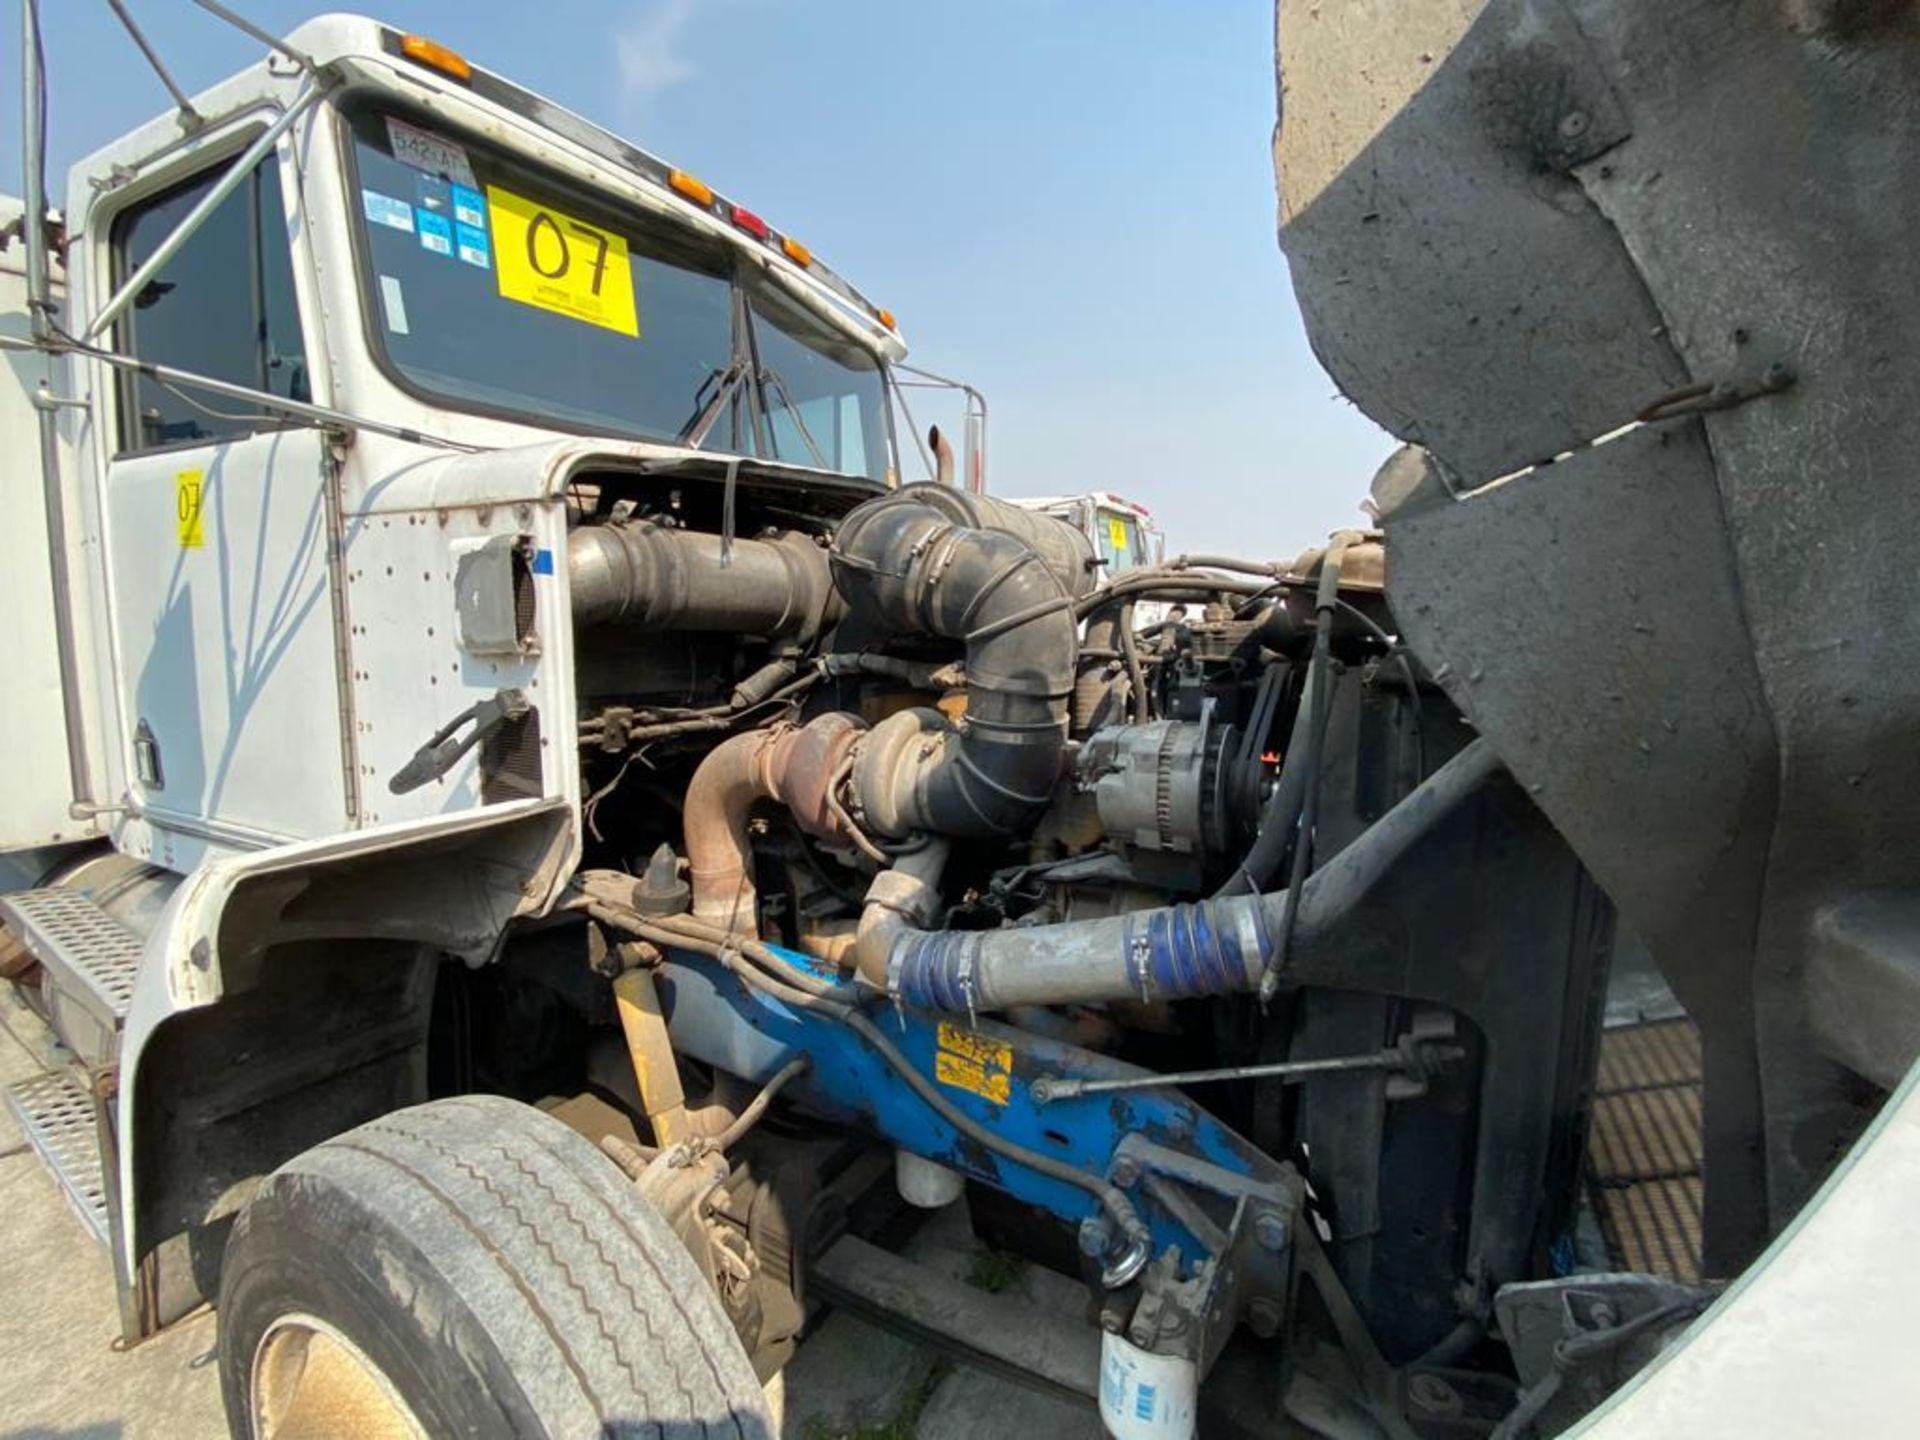 1999 Kenworth Sleeper truck tractor, standard transmission of 18 speeds - Image 58 of 72